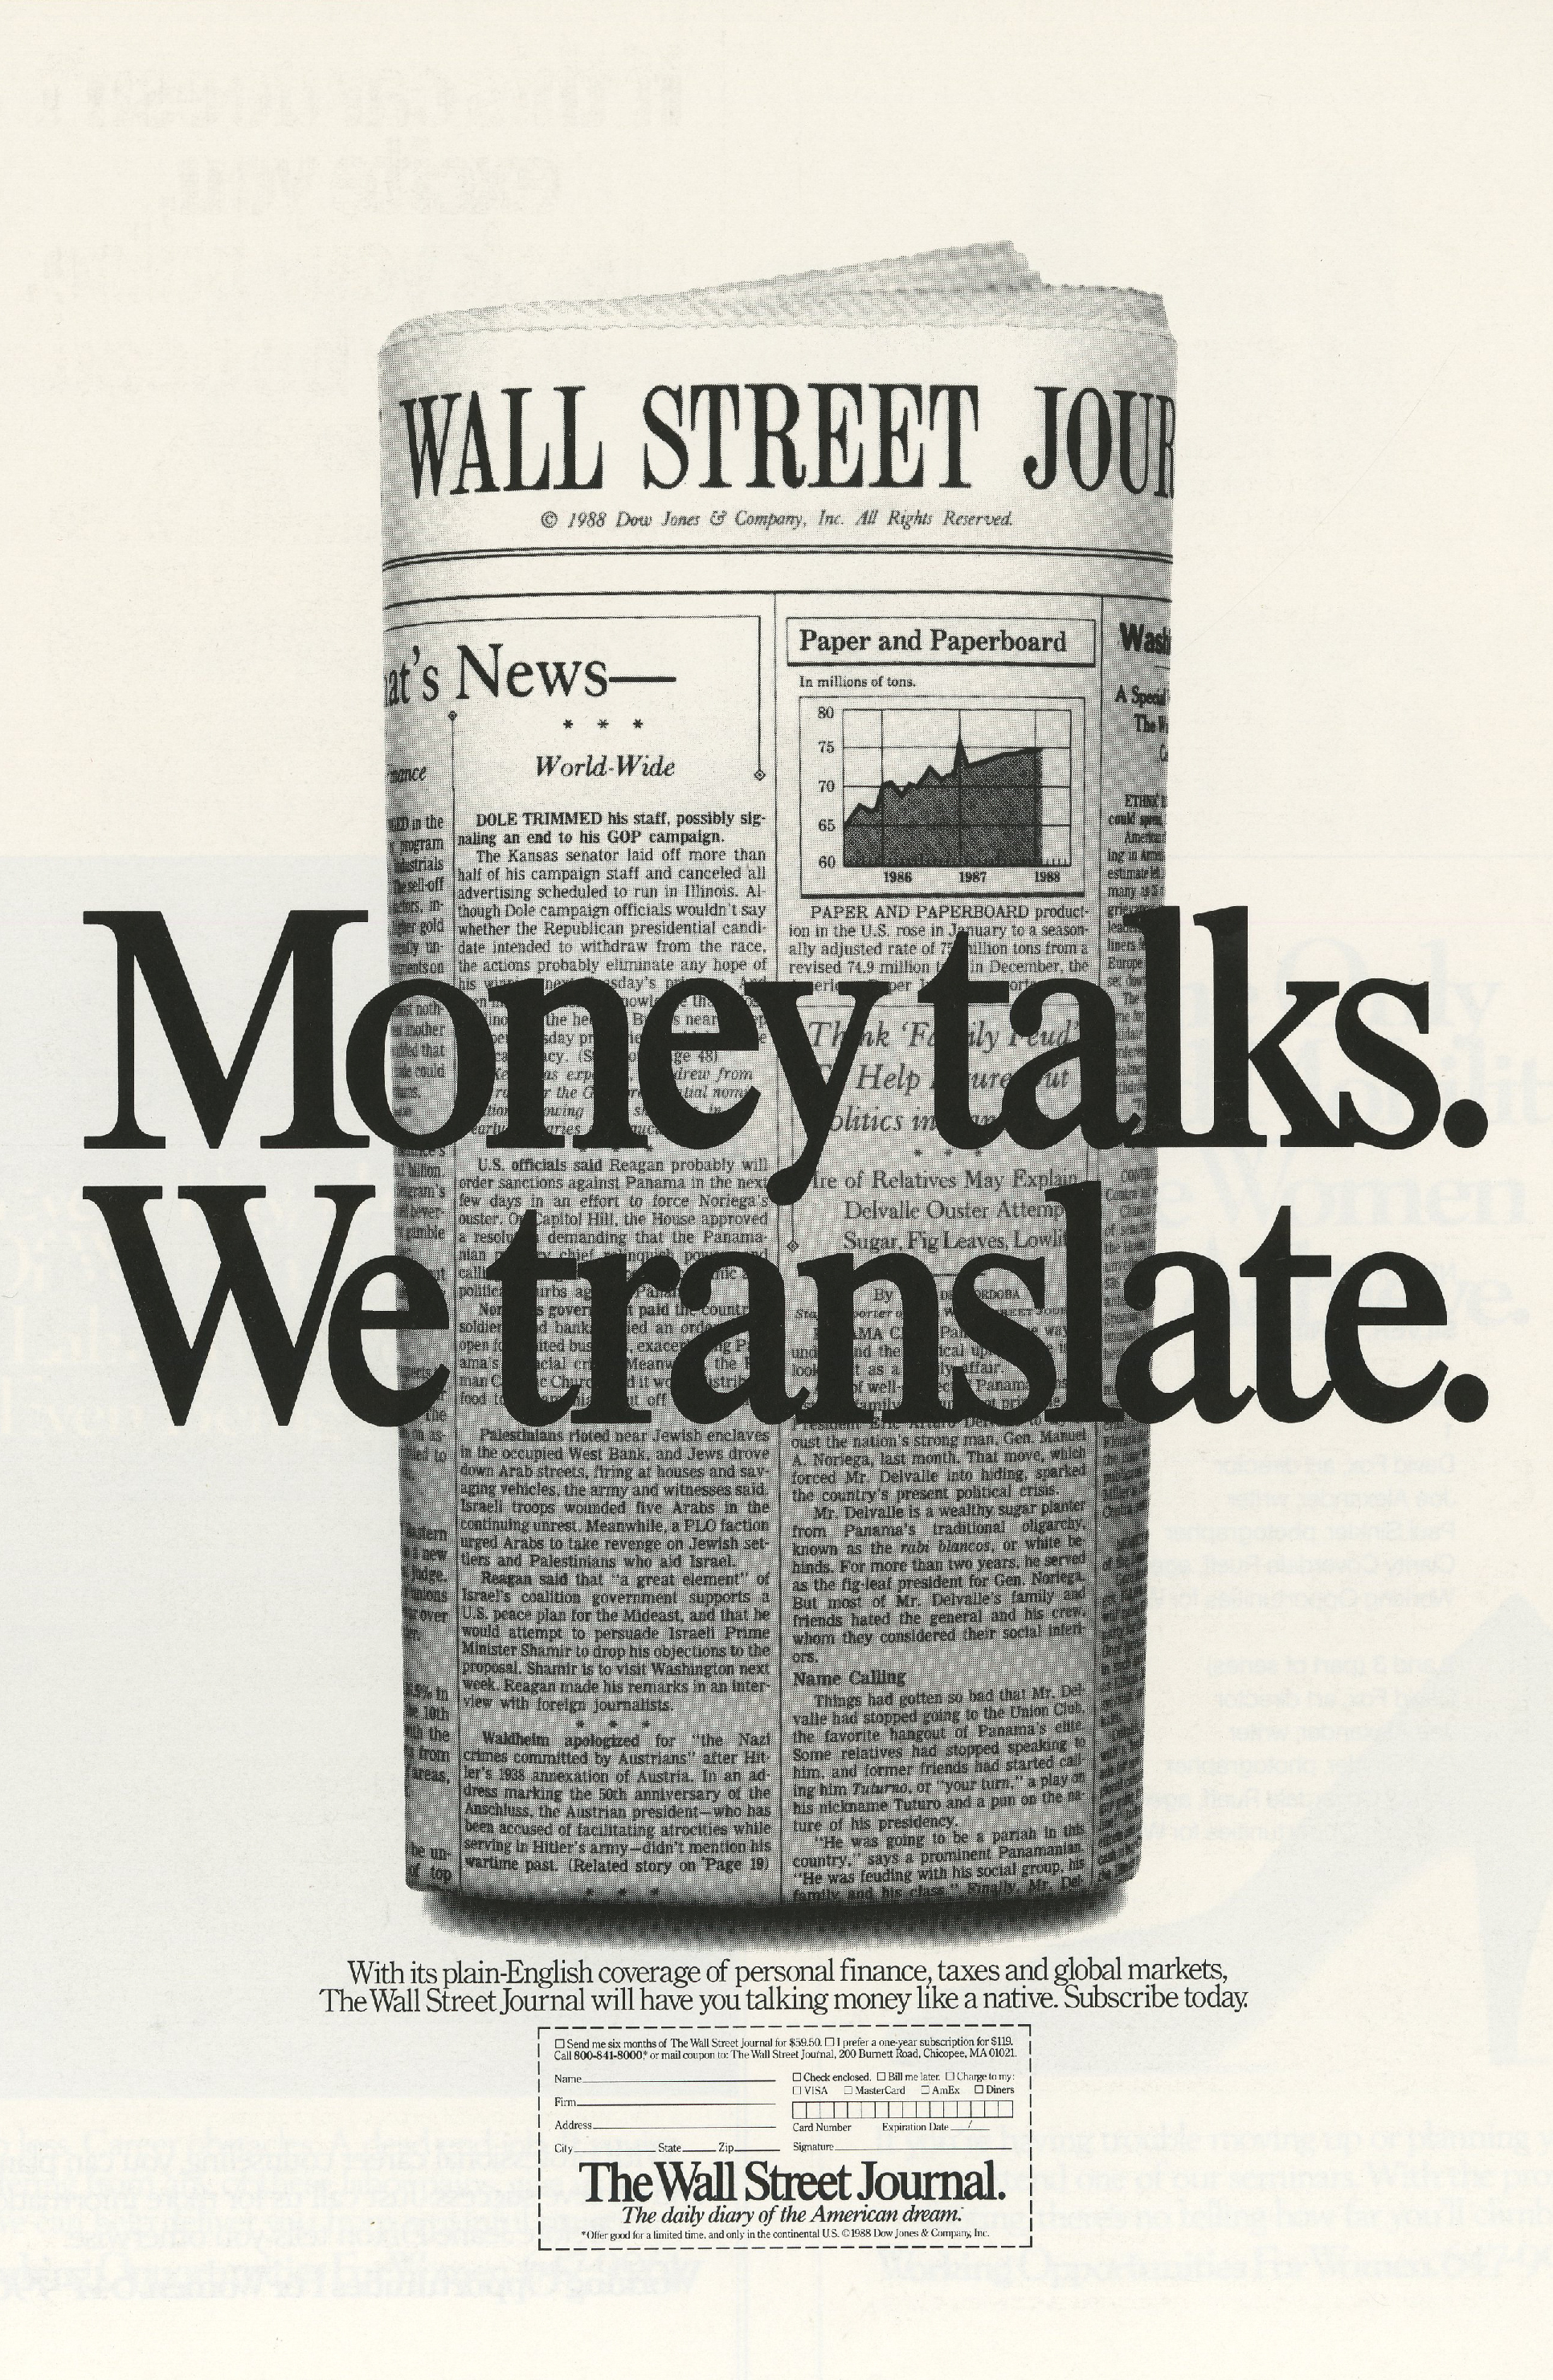 Fallon McElligott, WSJ 'Translate'-01